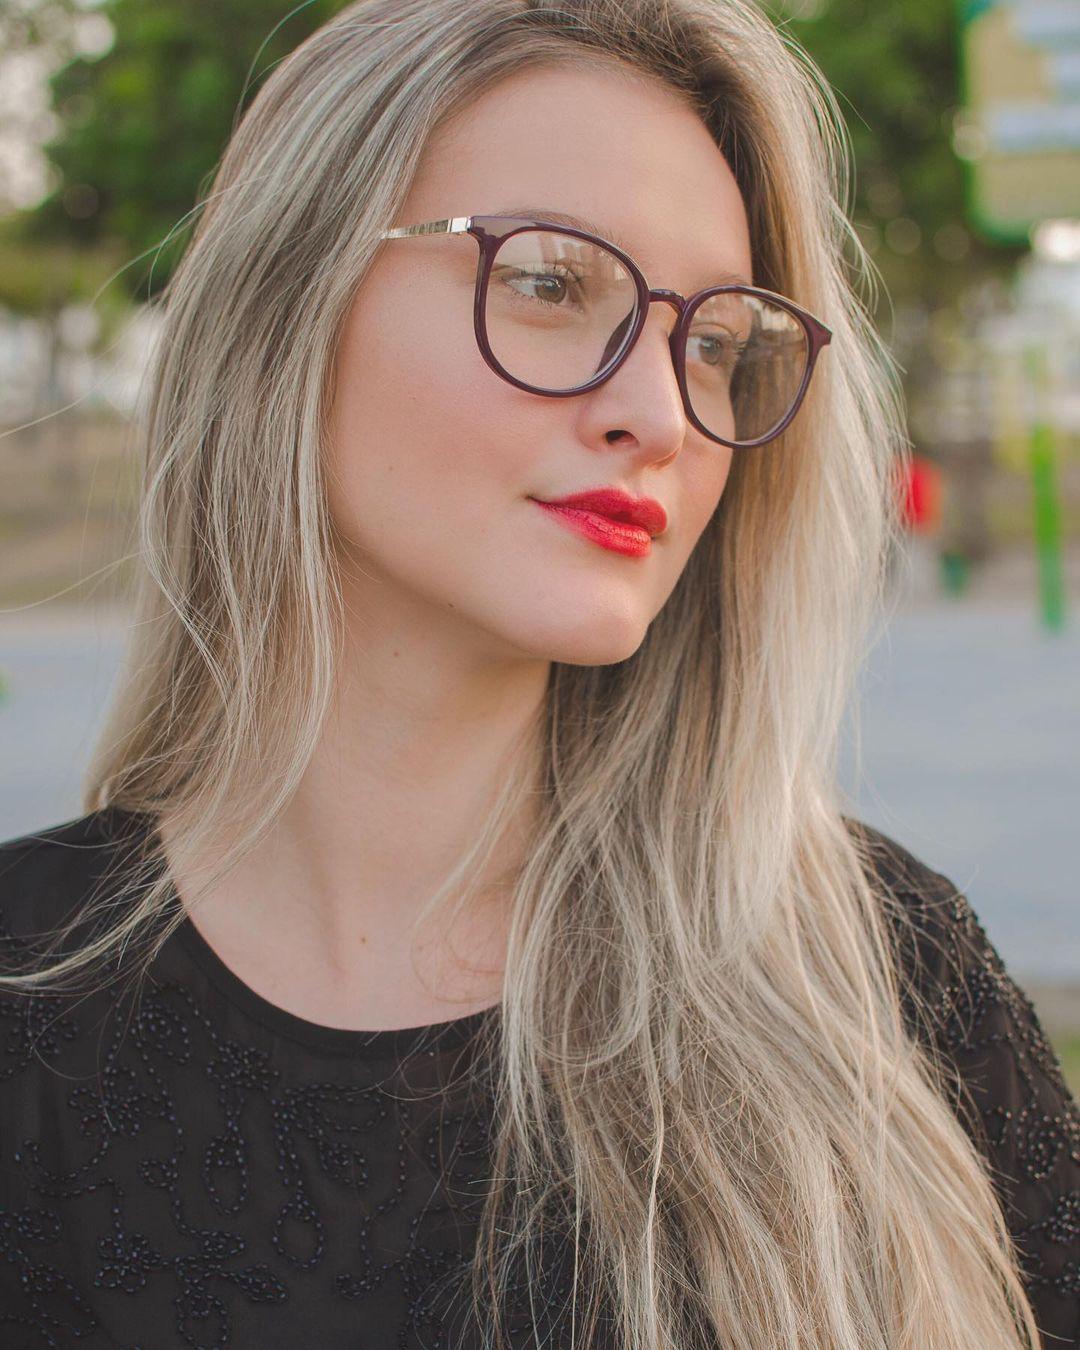 larissa neiverth, top 20 de miss brasil mundo 2019. - Página 4 Qggcxf10